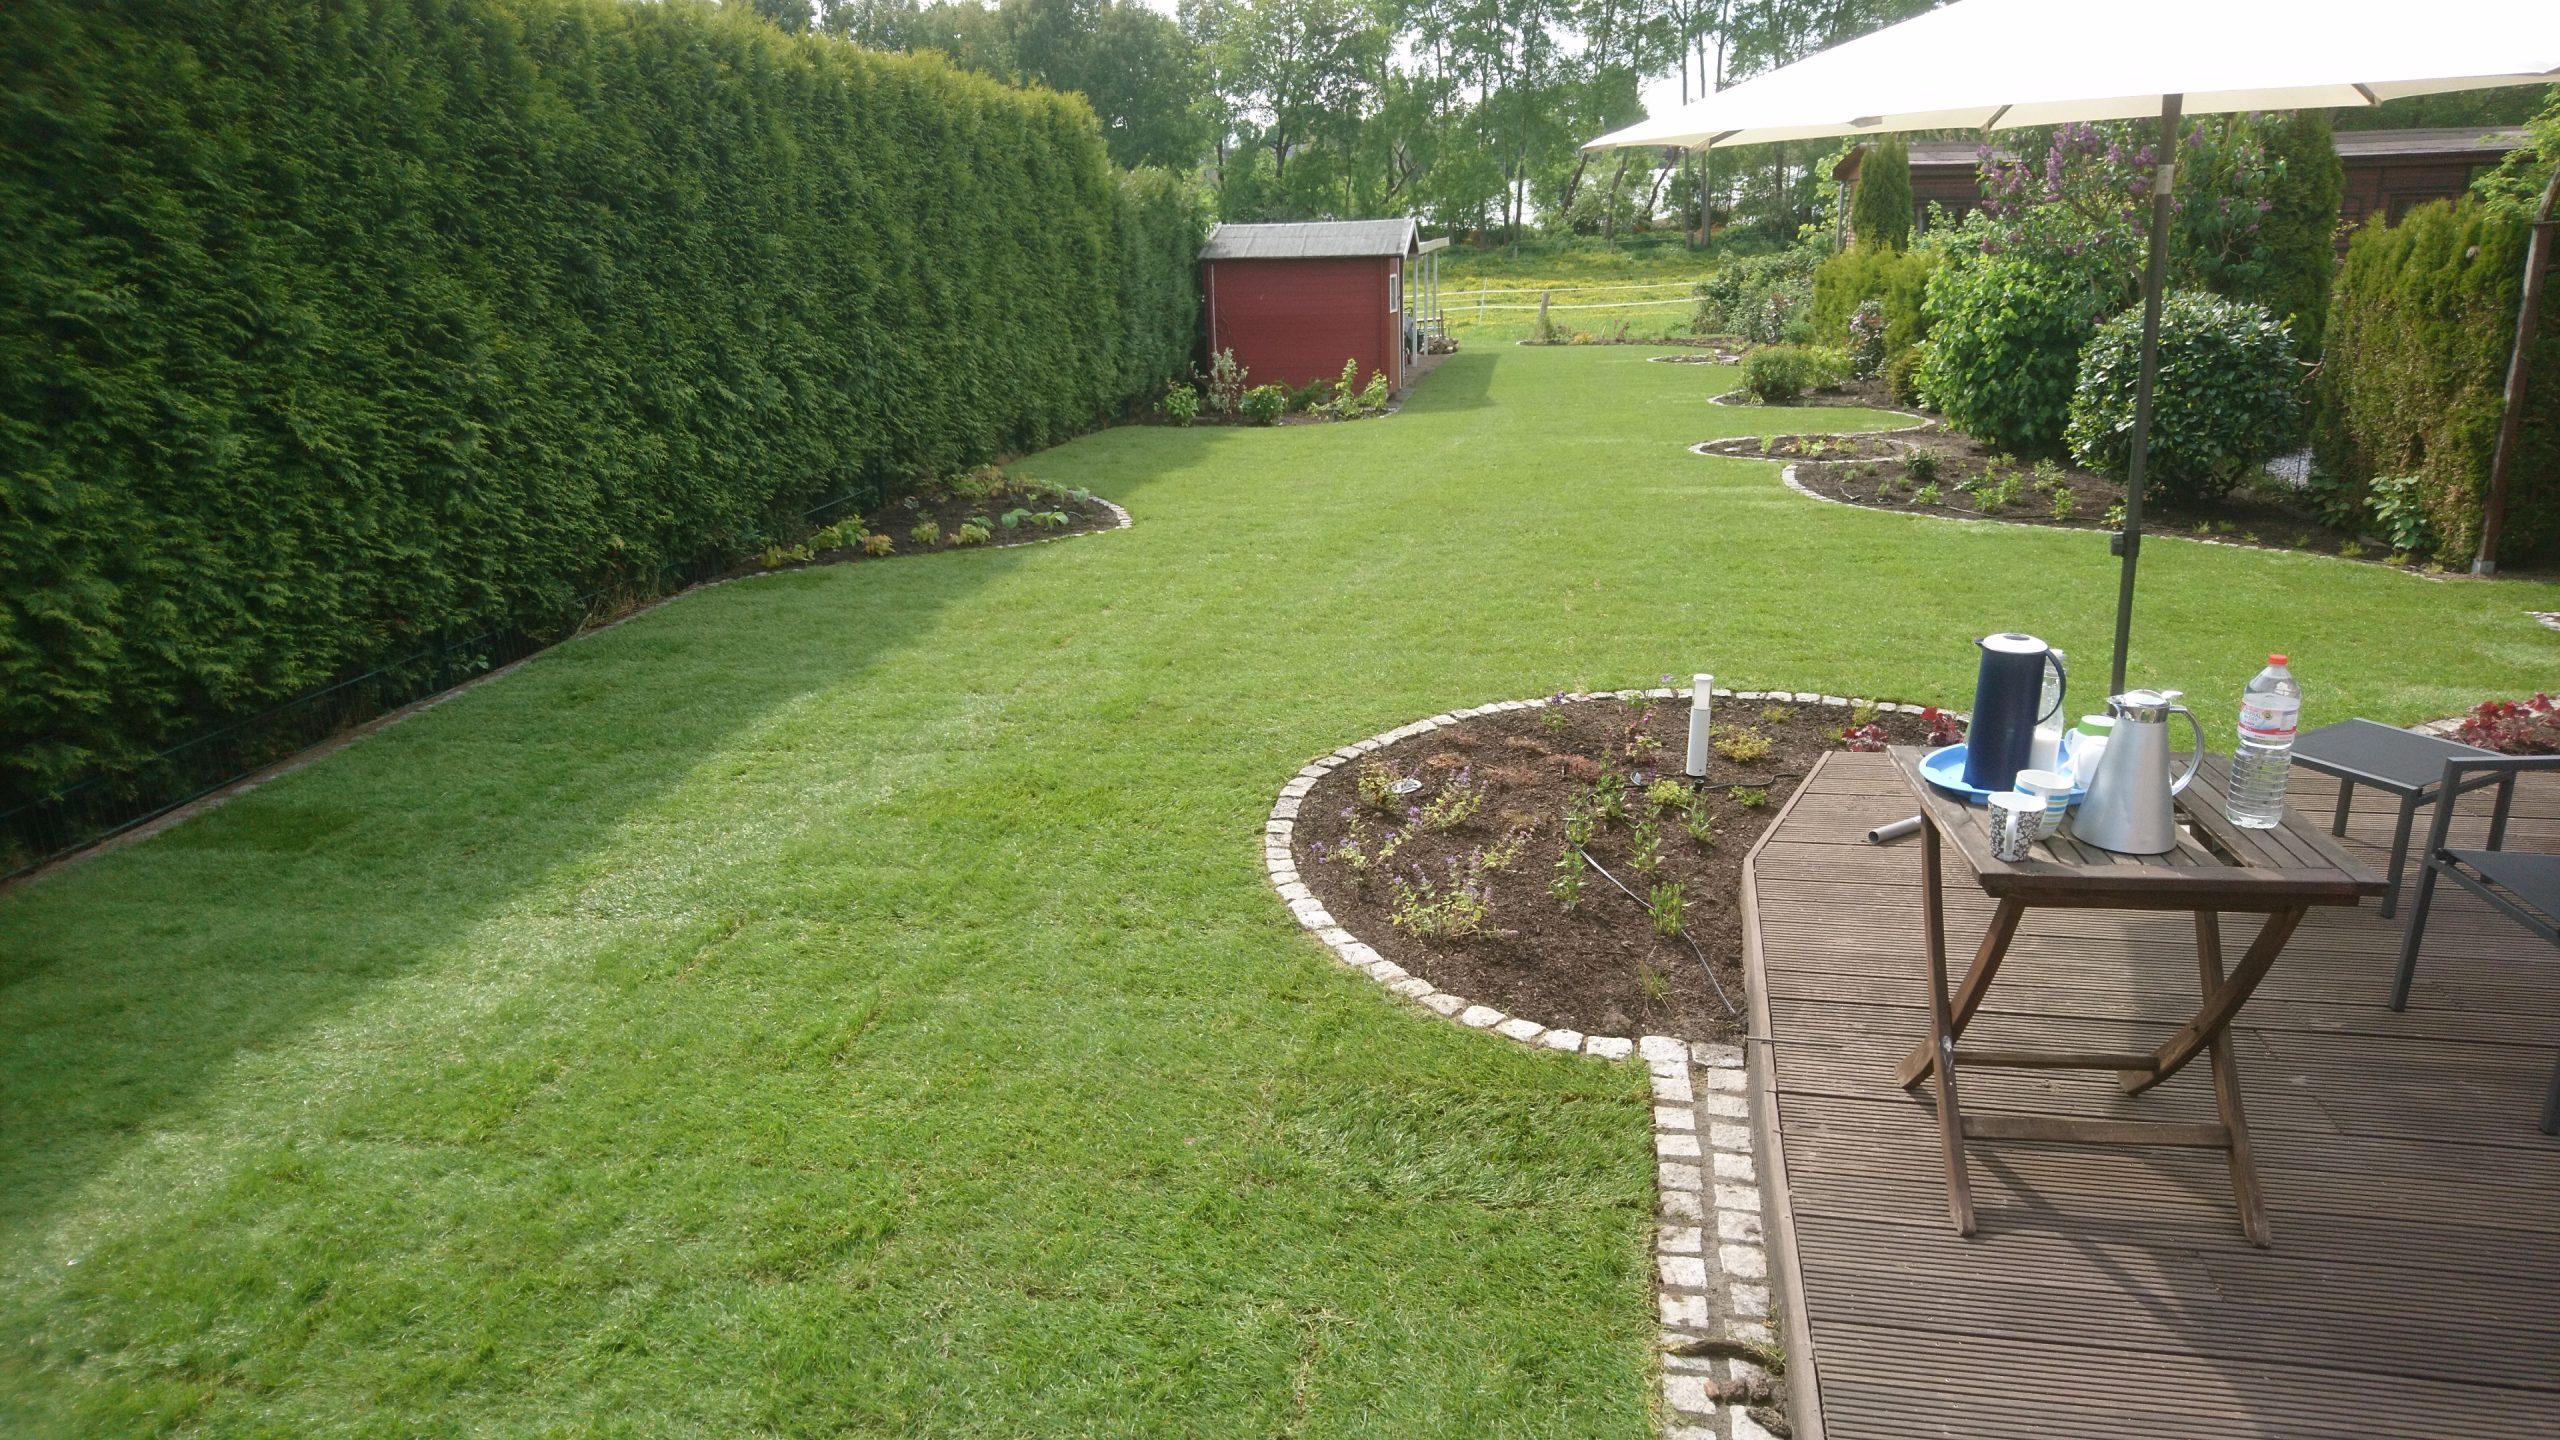 Gartengestaltung Reinhard Garber GbR in Brunsbek